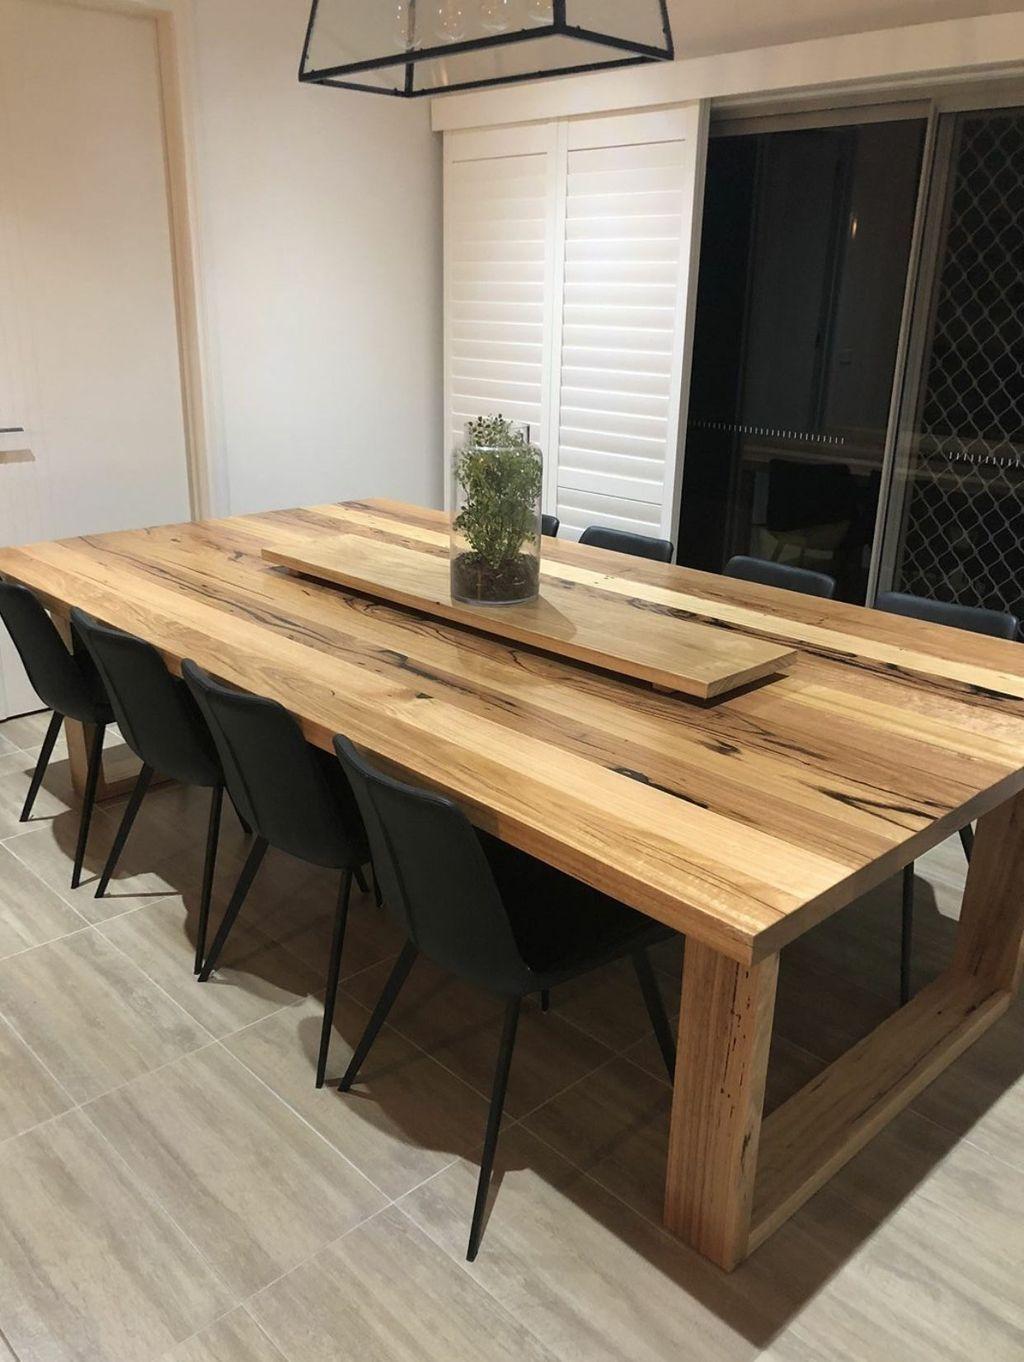 diy wooden table legs ideas